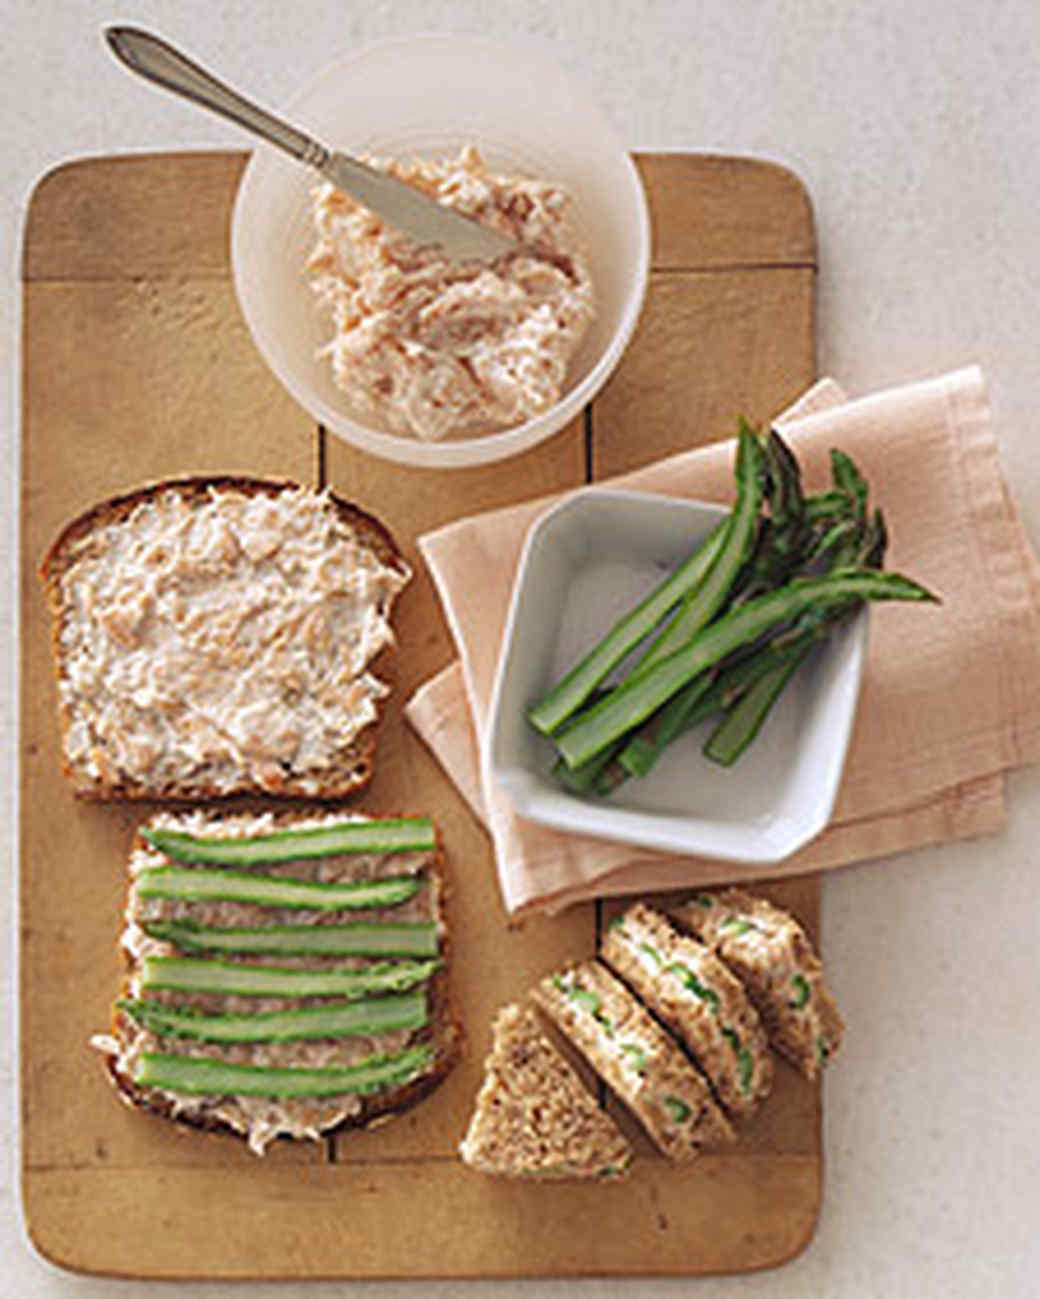 Tea Sandwiches with Cream Cheese and Asparagus